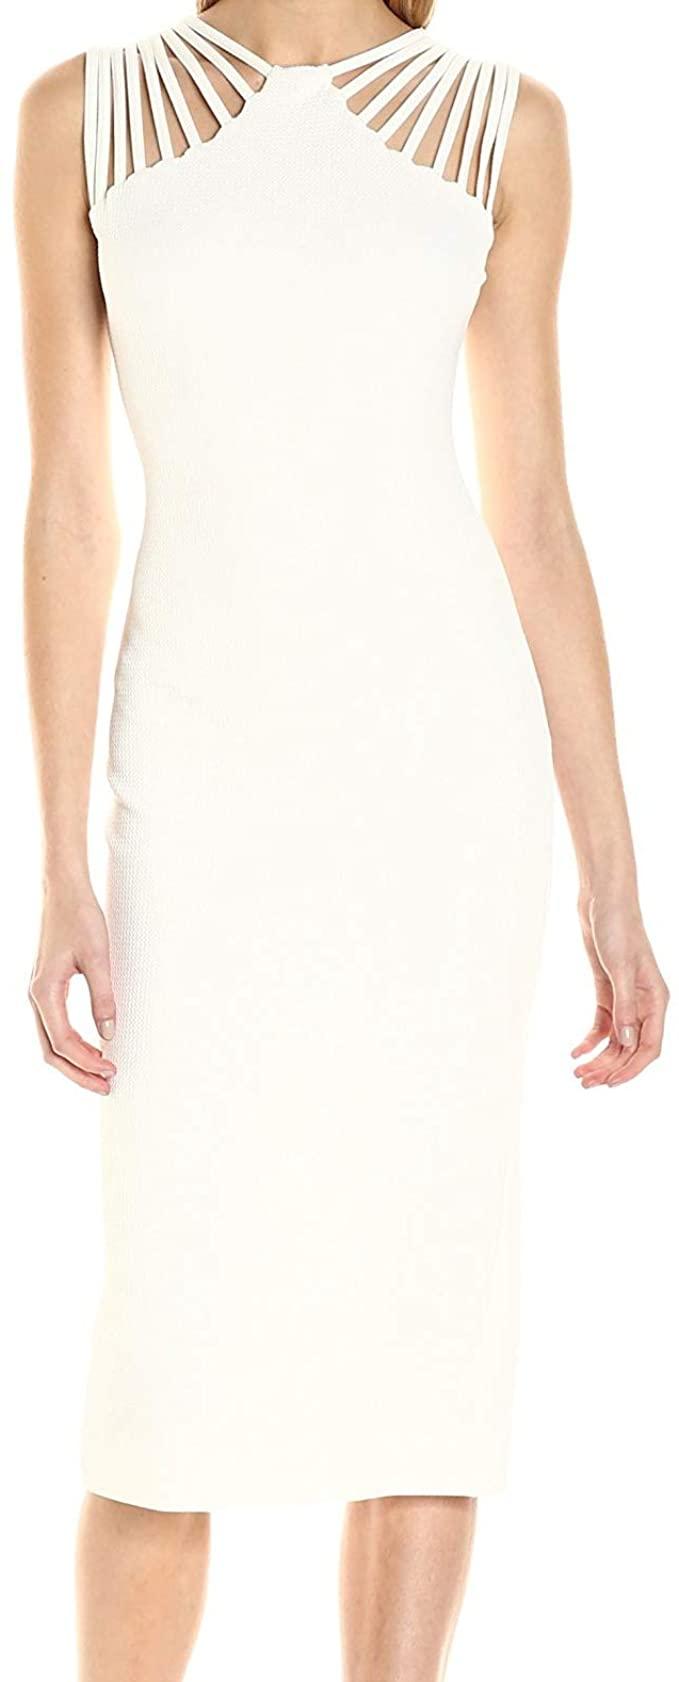 Dress The Population Women S Gwen Cutout Stretch Midi Dress At Amazon Women S Clothing Store In 2021 Dress The Population Stretch Midi Dress Dresses [ 1682 x 679 Pixel ]